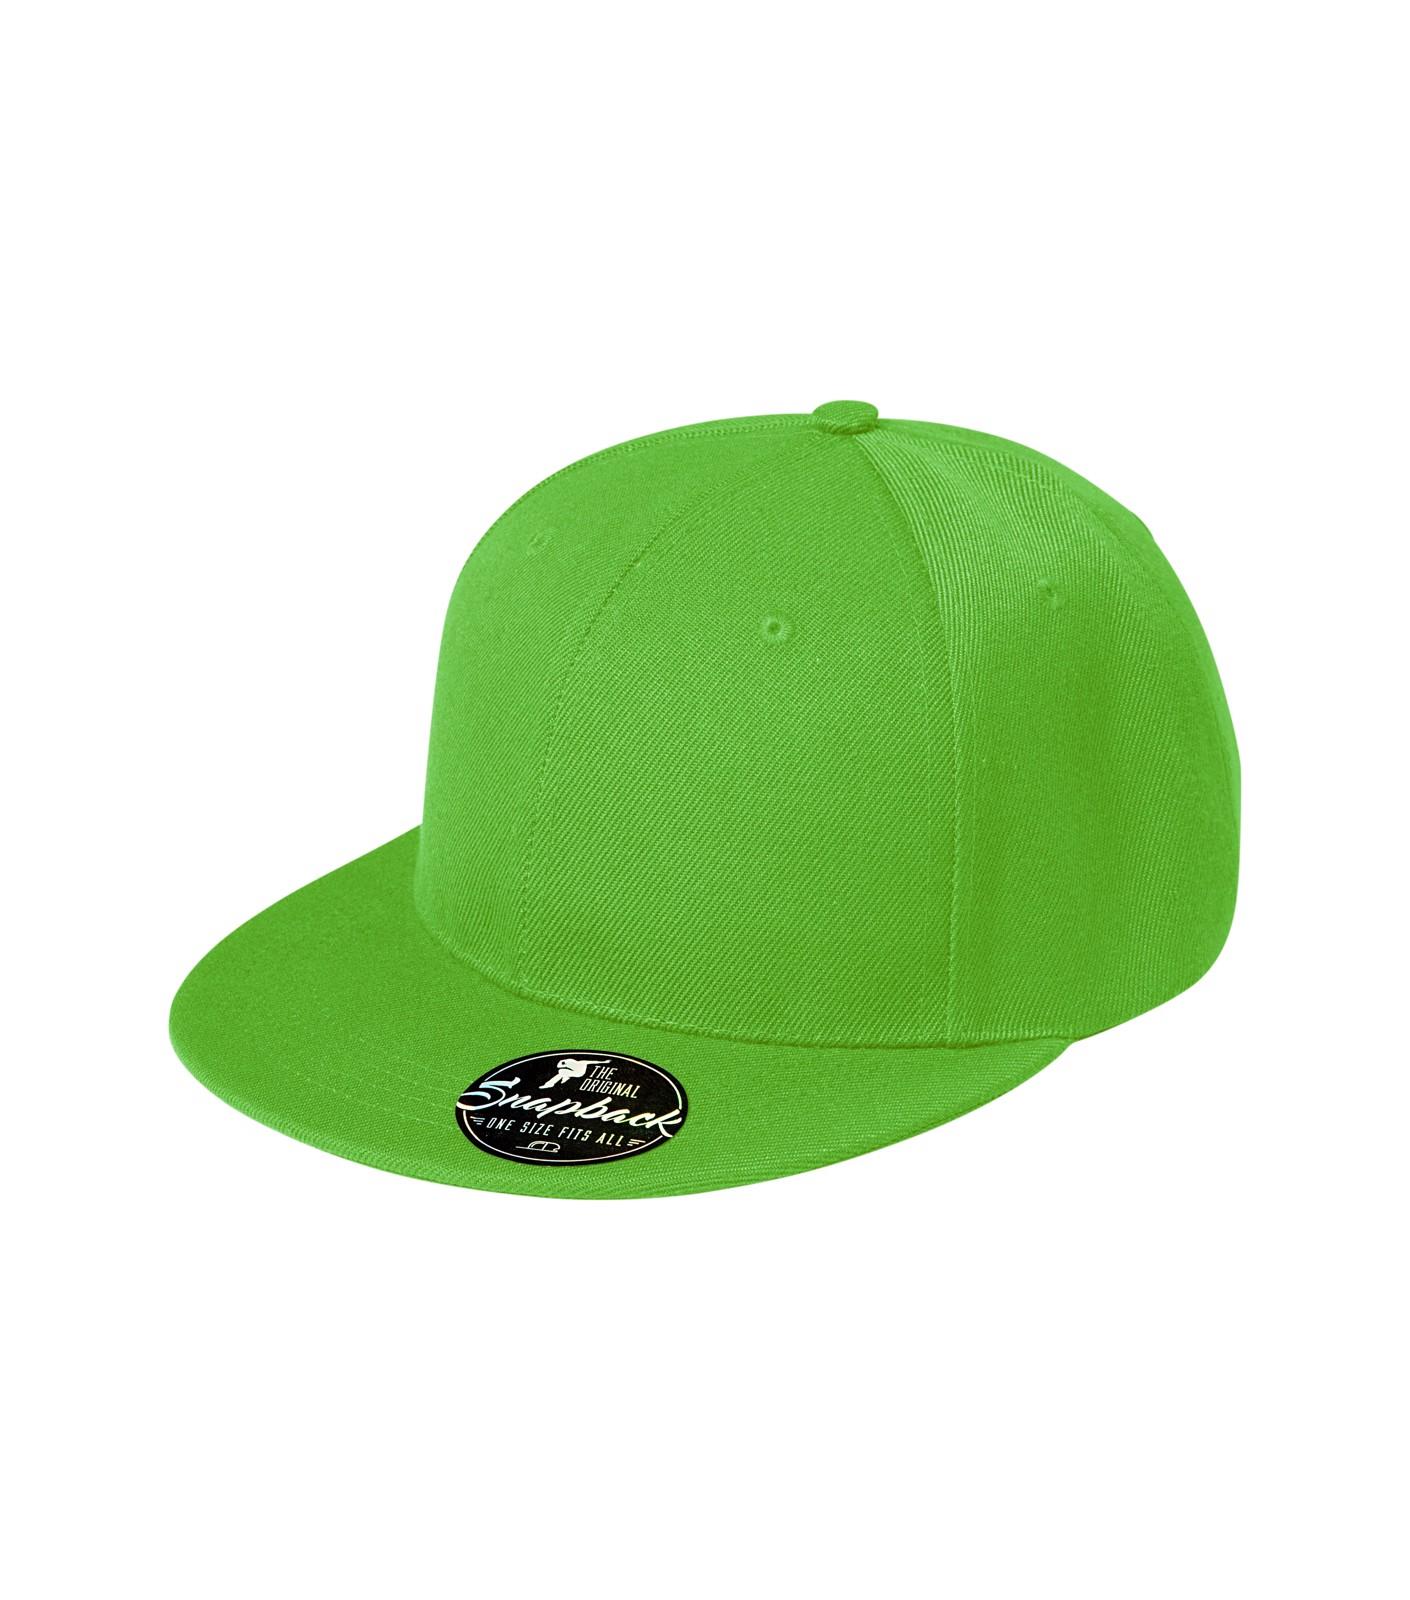 Čepice unisex Malfini Rap 6P - Apple Green / nastavitelná